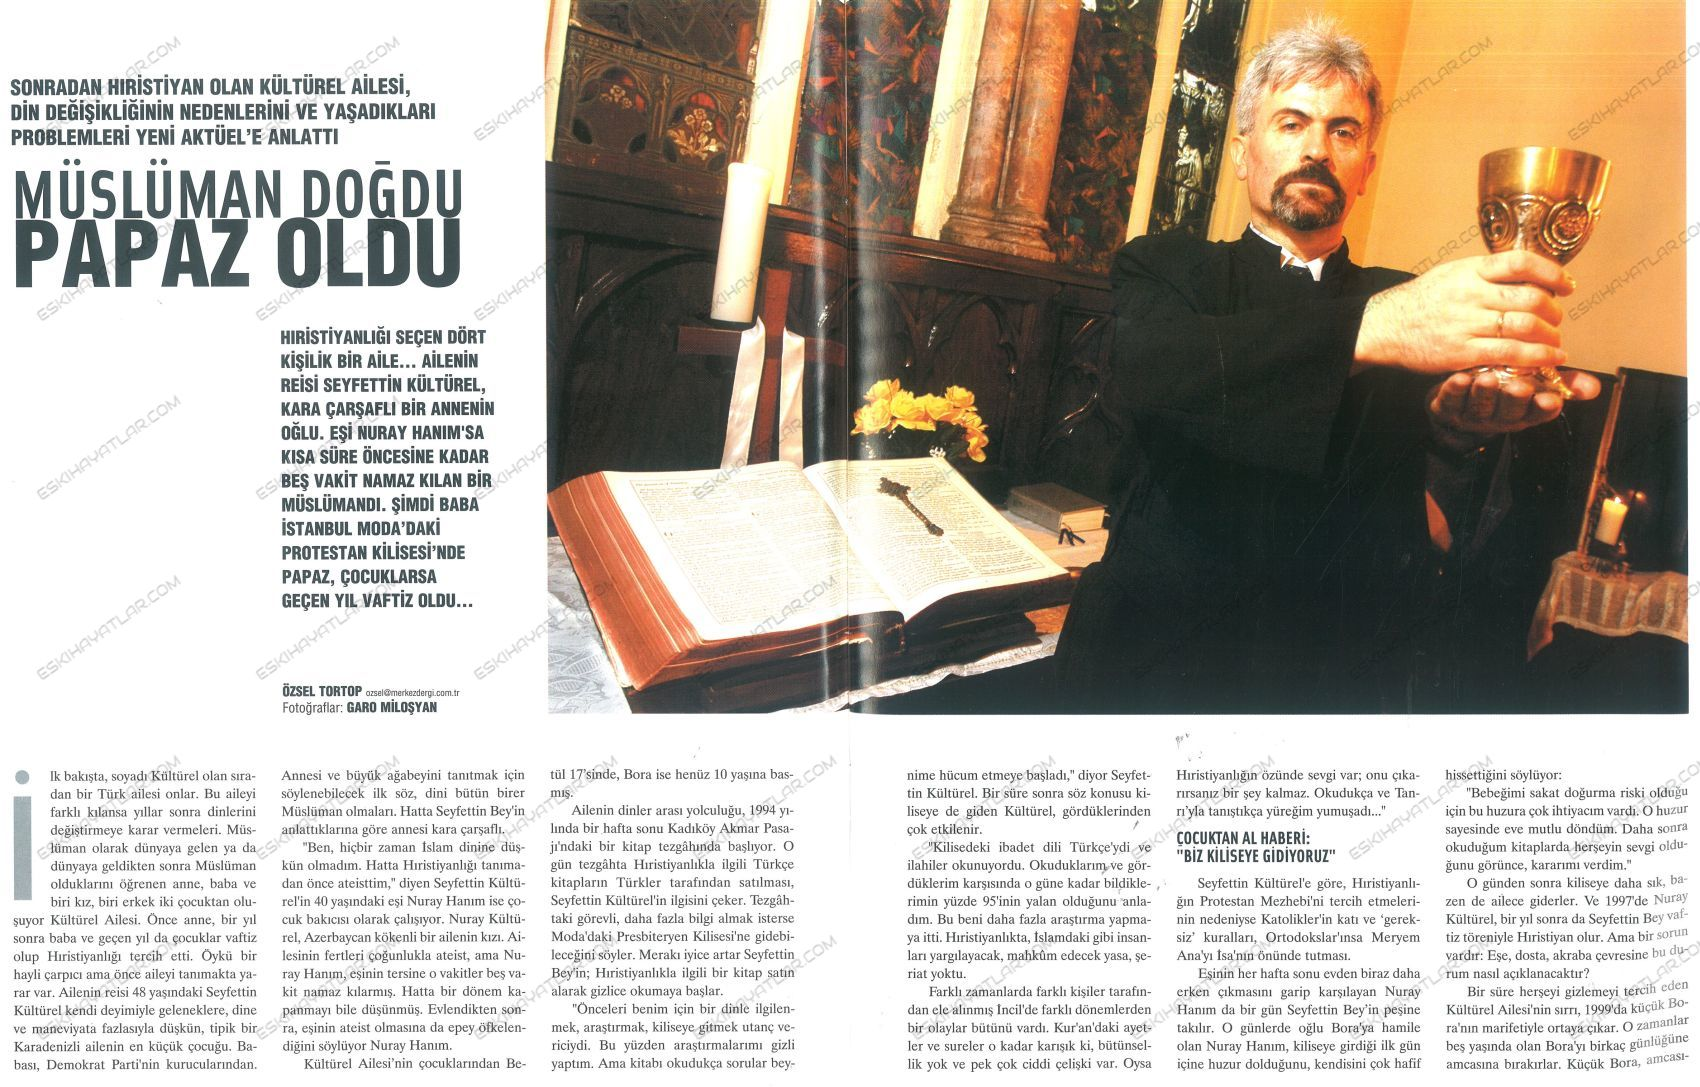 0343-seyfettin-kulturel-2004-aktuel-dergisi-musluman-dogdu-papaz-oldu (1)